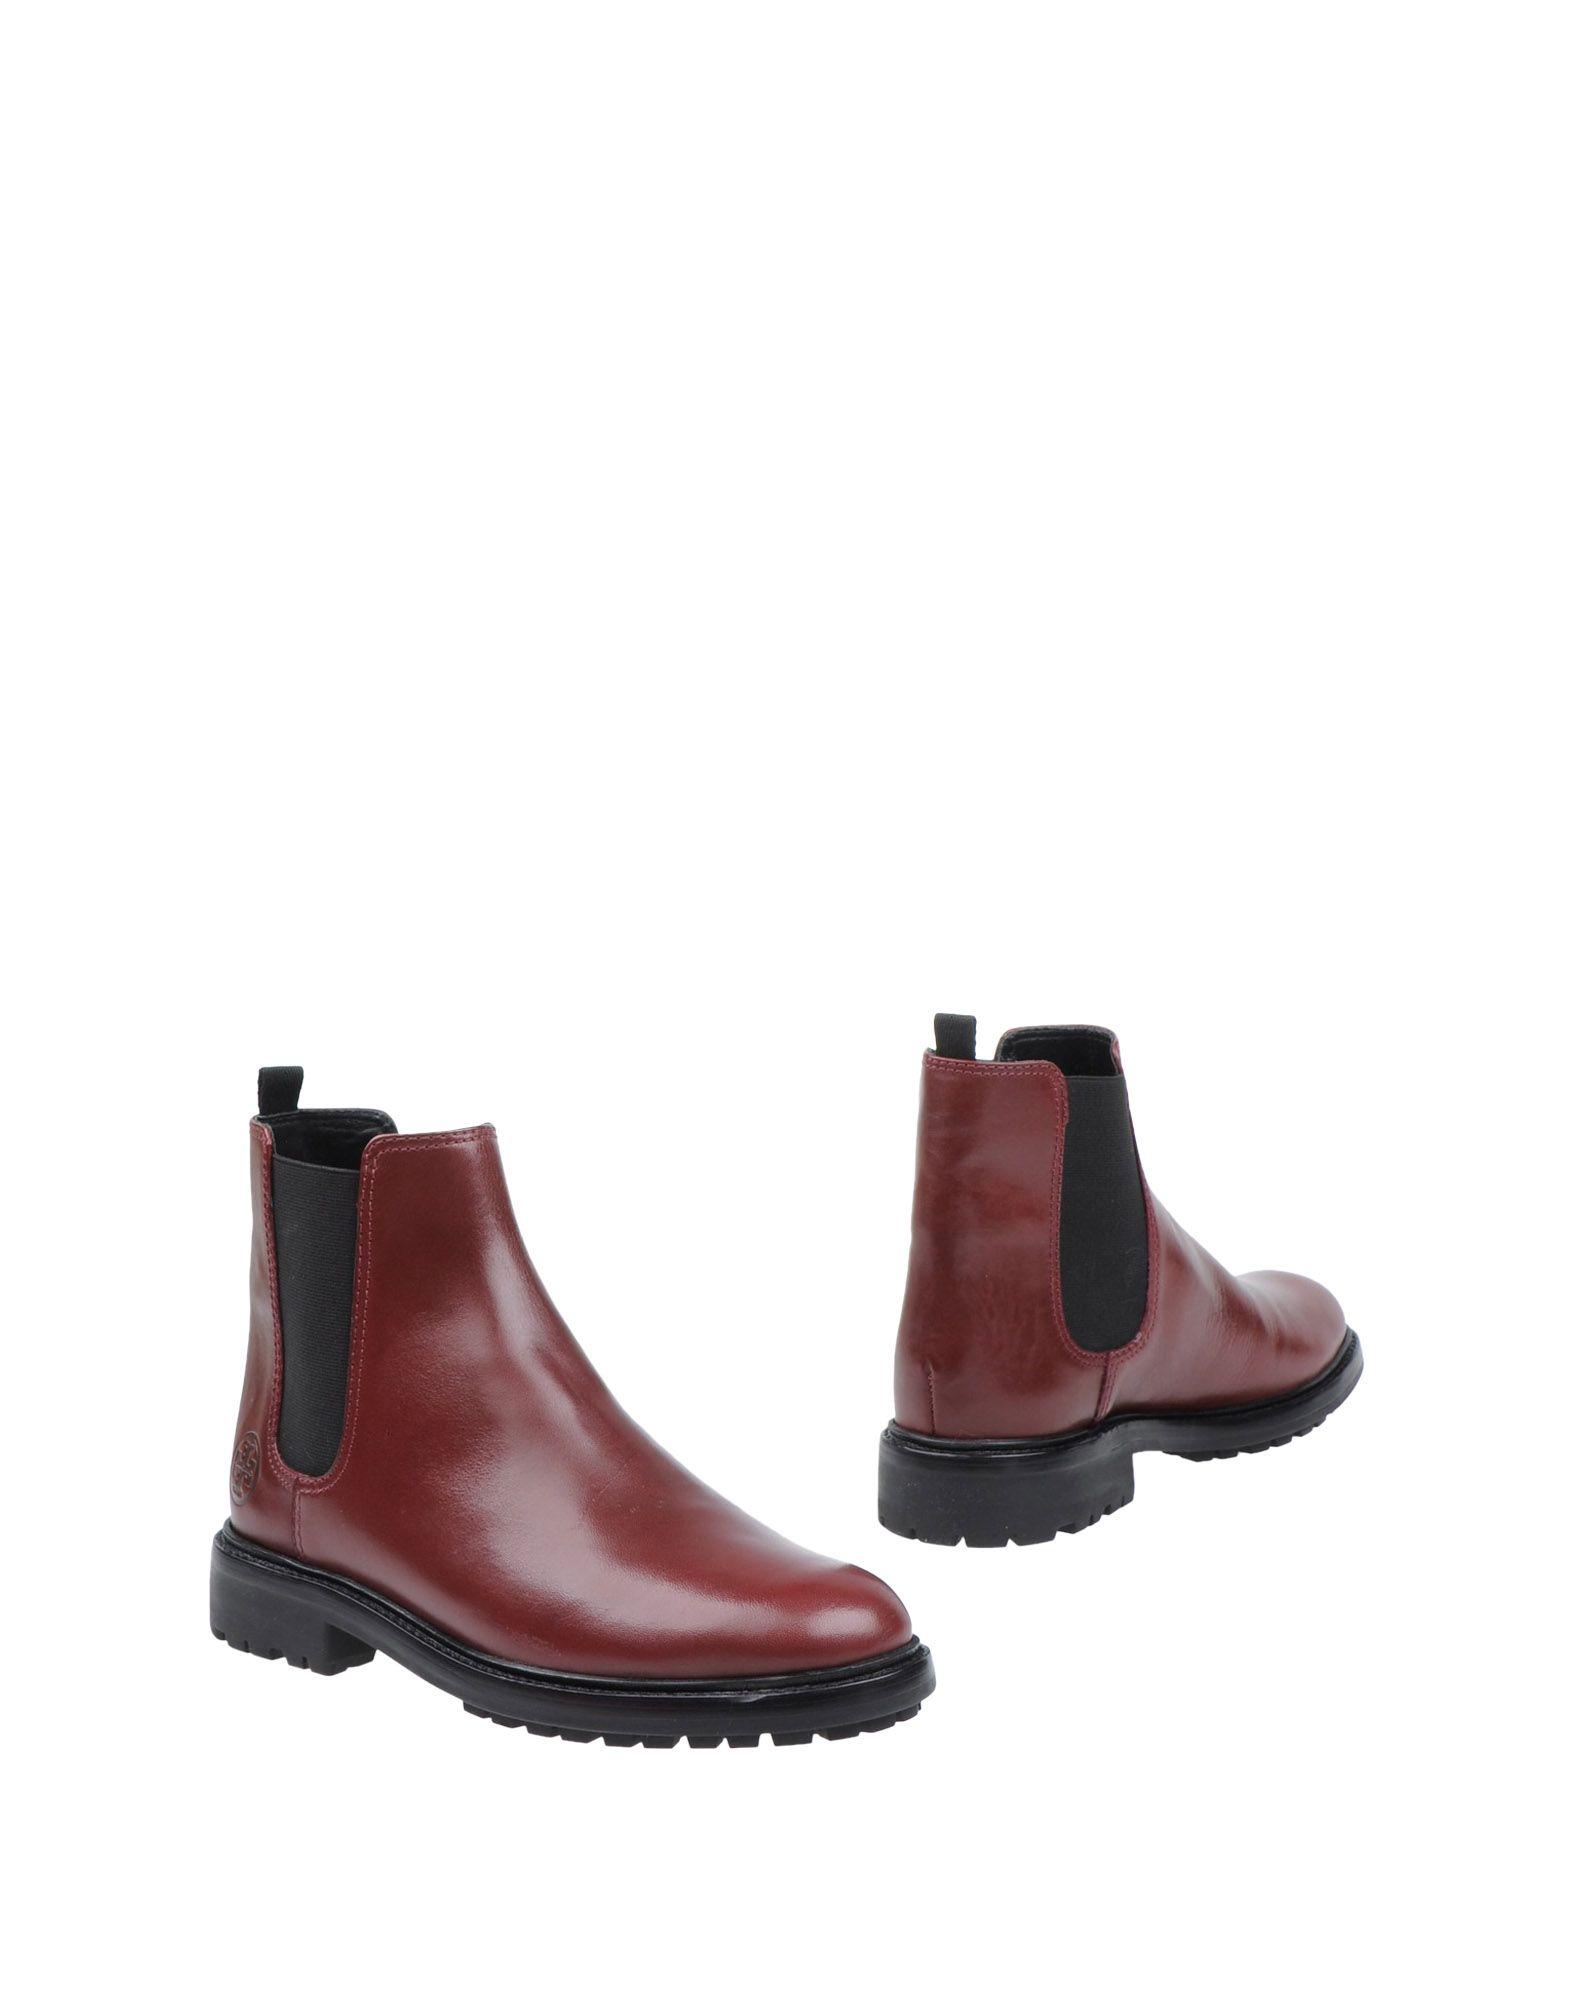 Chelsea Boots Tory Burch Donna - Acquista online su